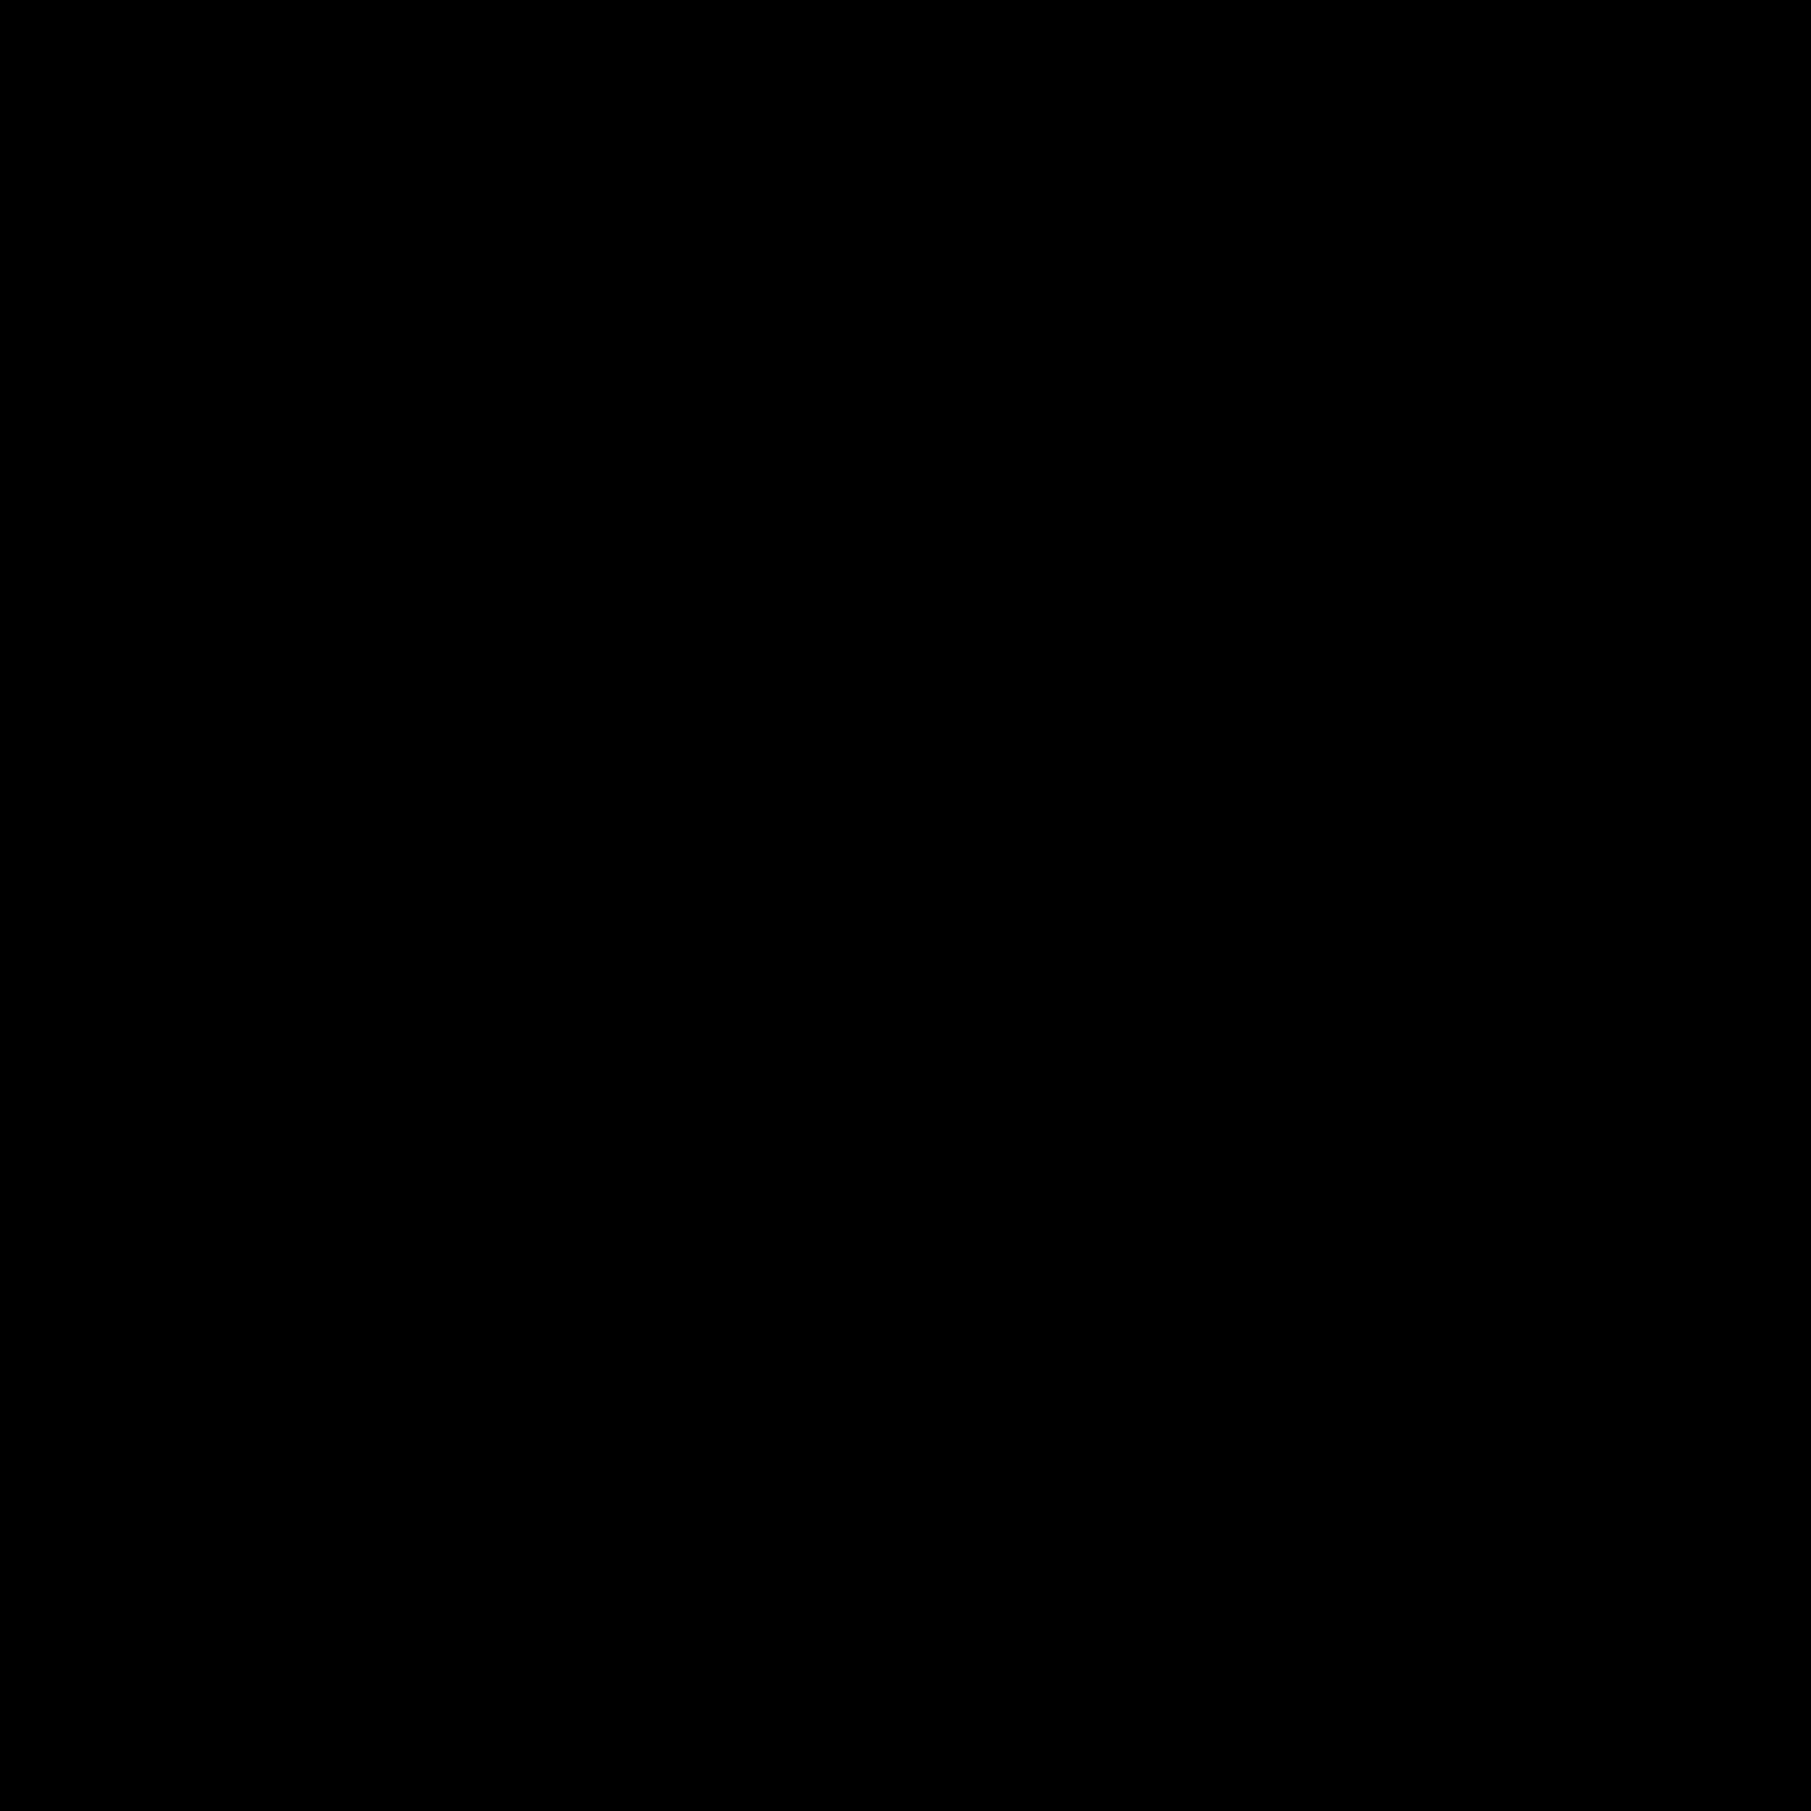 cellular 2g to 3g transition sunset cellular m2m